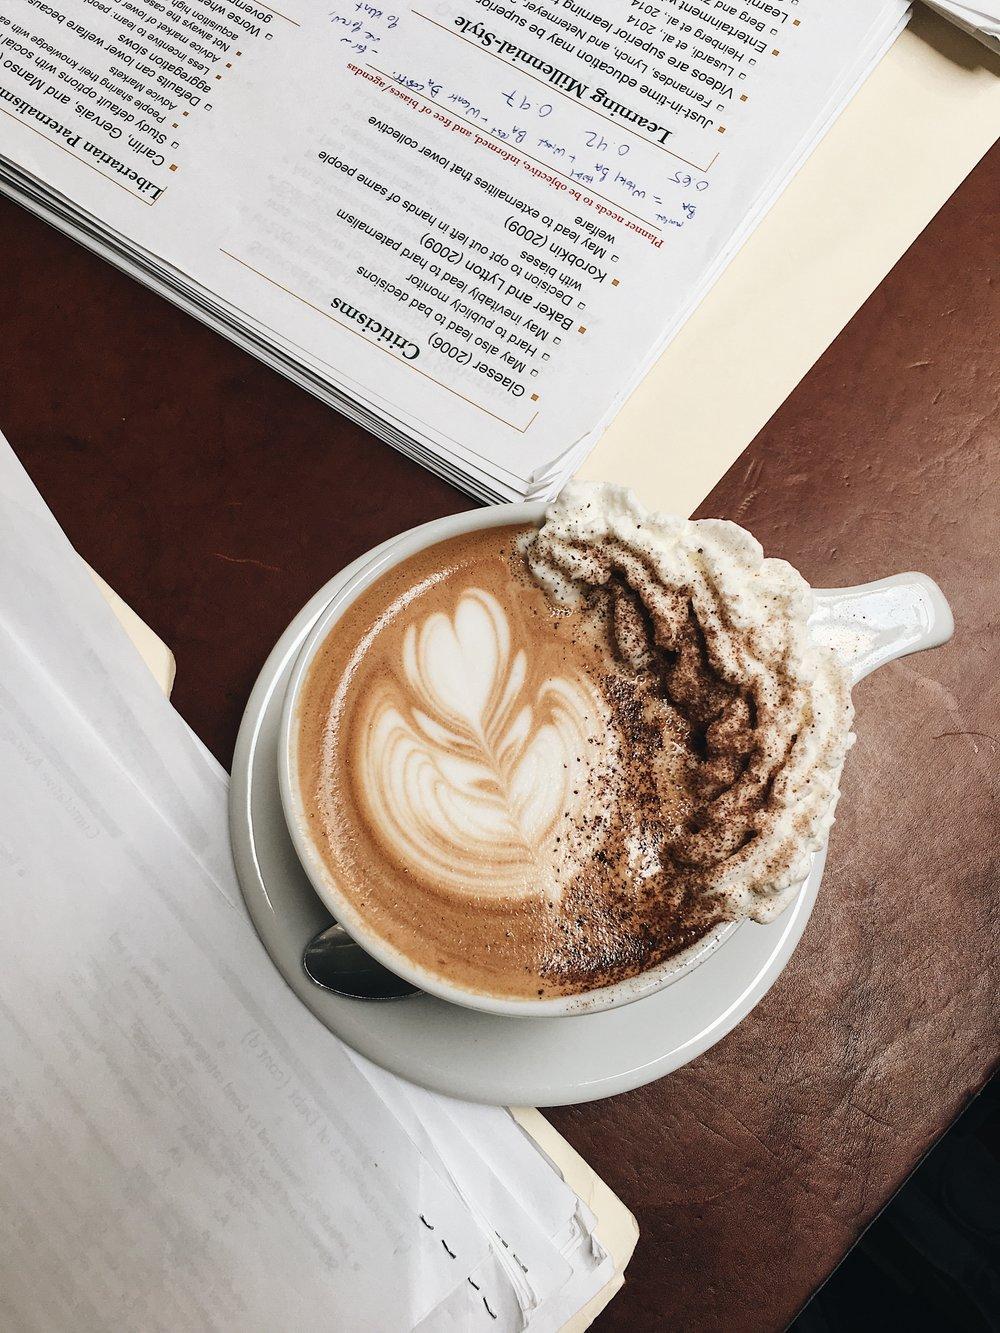 Verve Coffee and homework